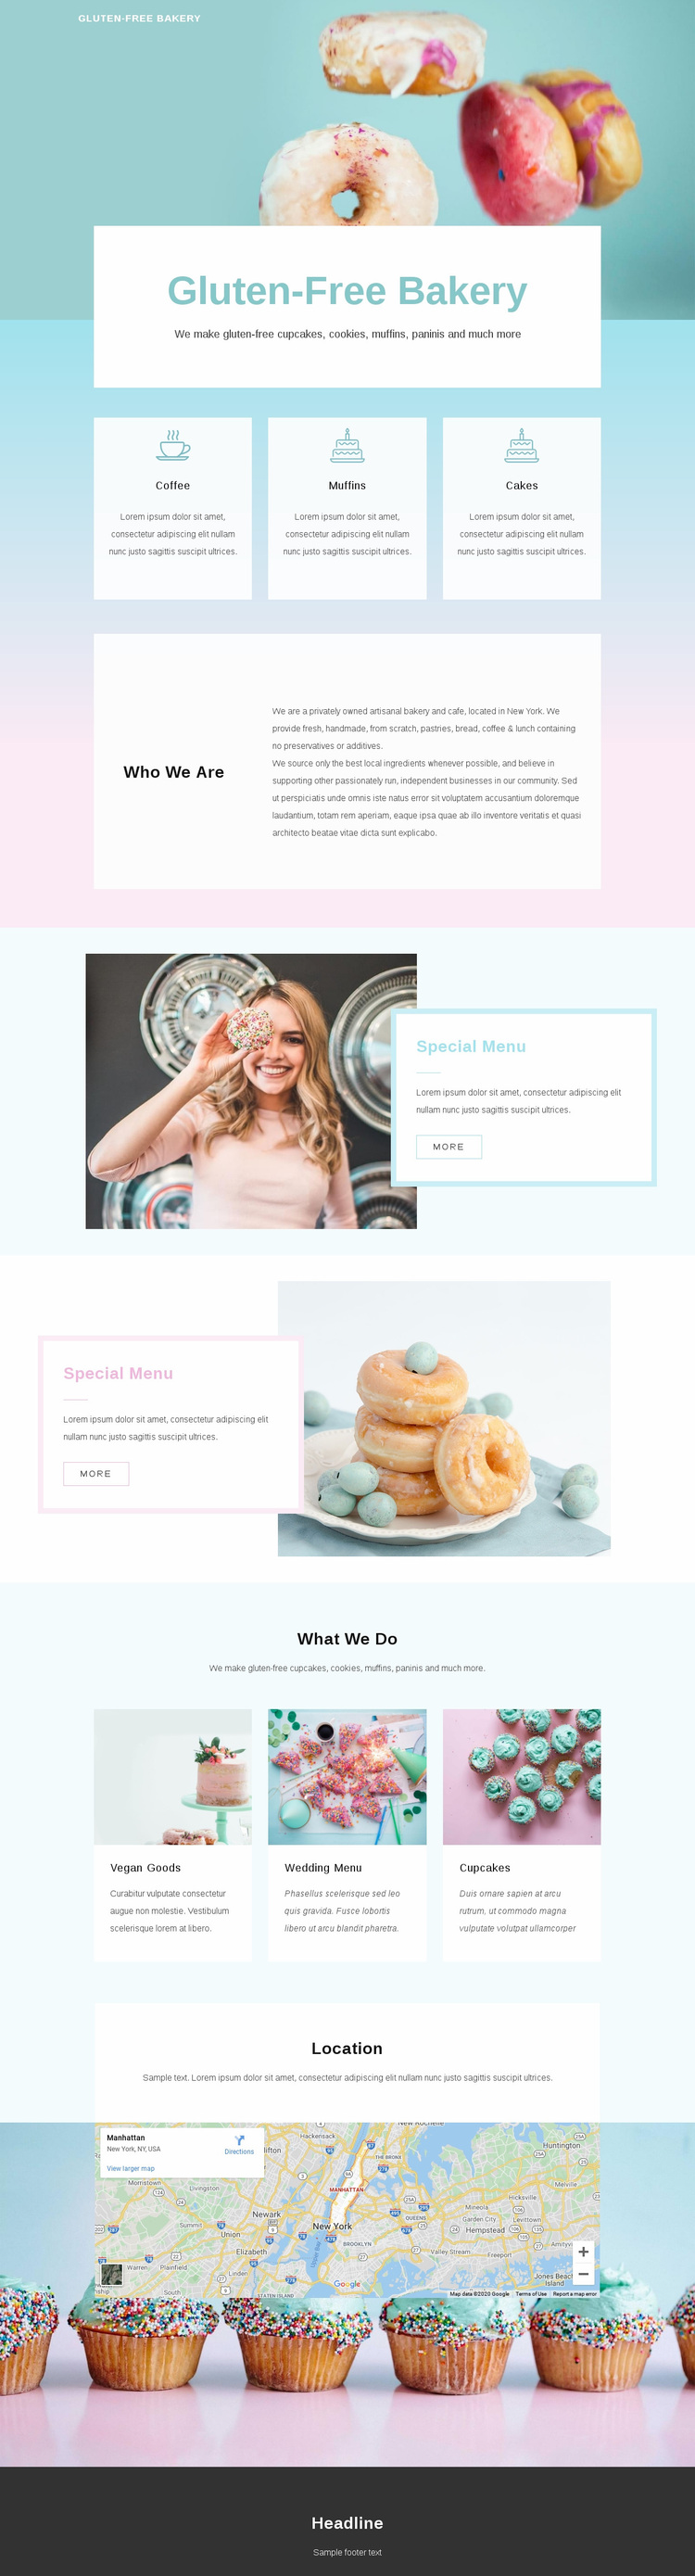 Gluten-Free Backery Web Page Designer